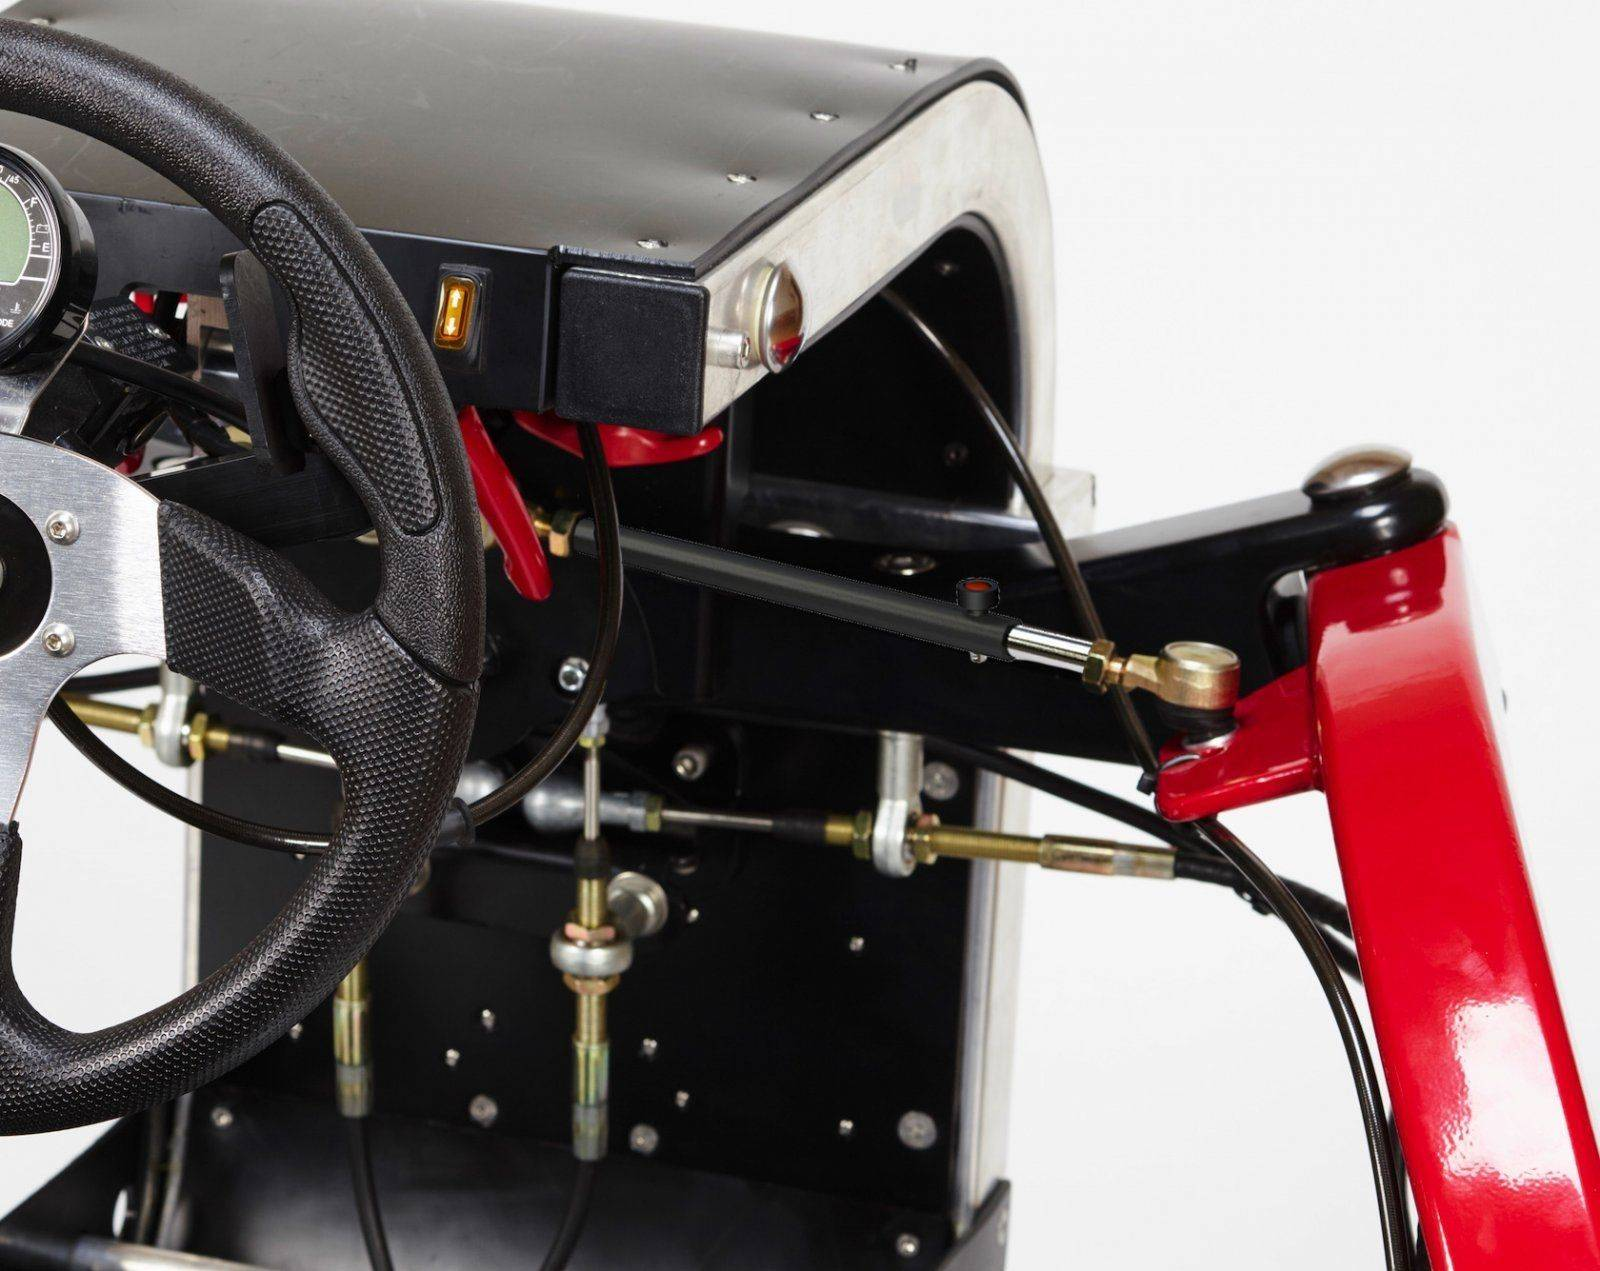 The-Swincar-E-Spider-static-steering-HIGH-RES-1.jpg